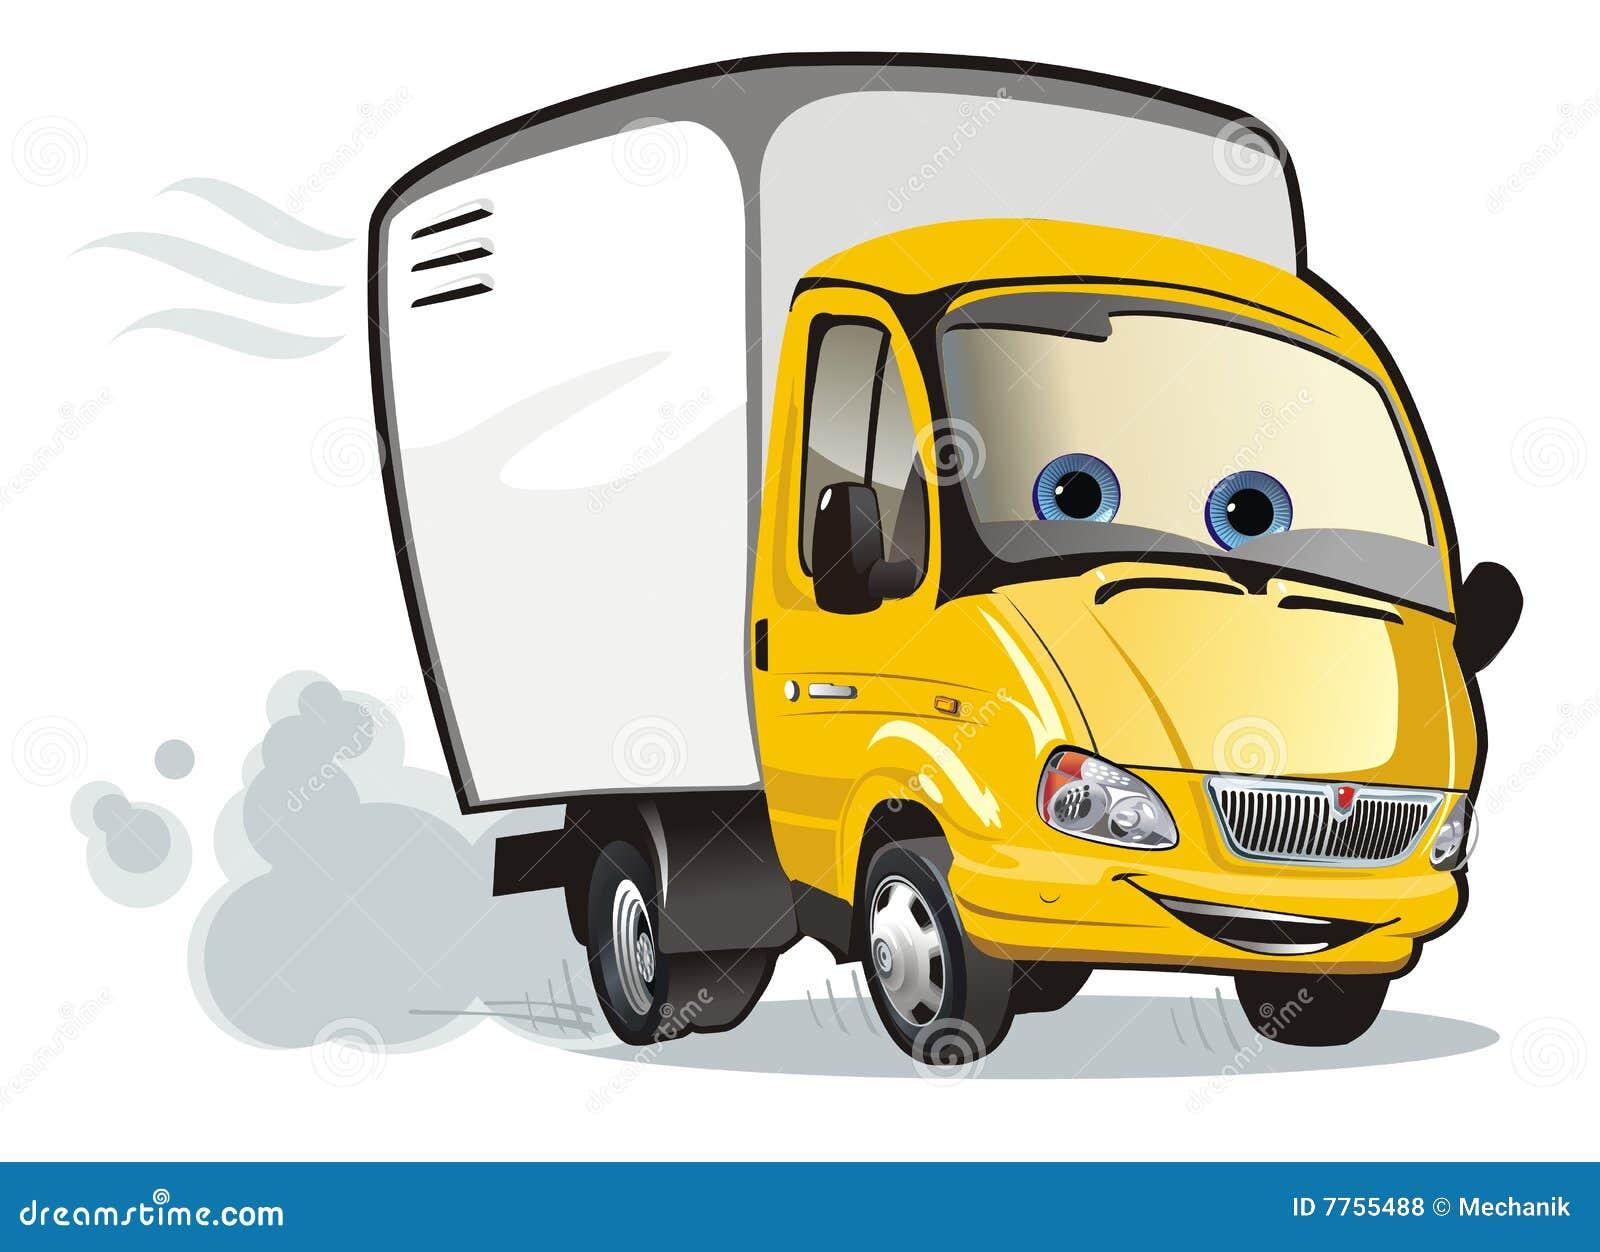 Cartoon Delivery / Cargo Truck Stock Vector - Illustration ...